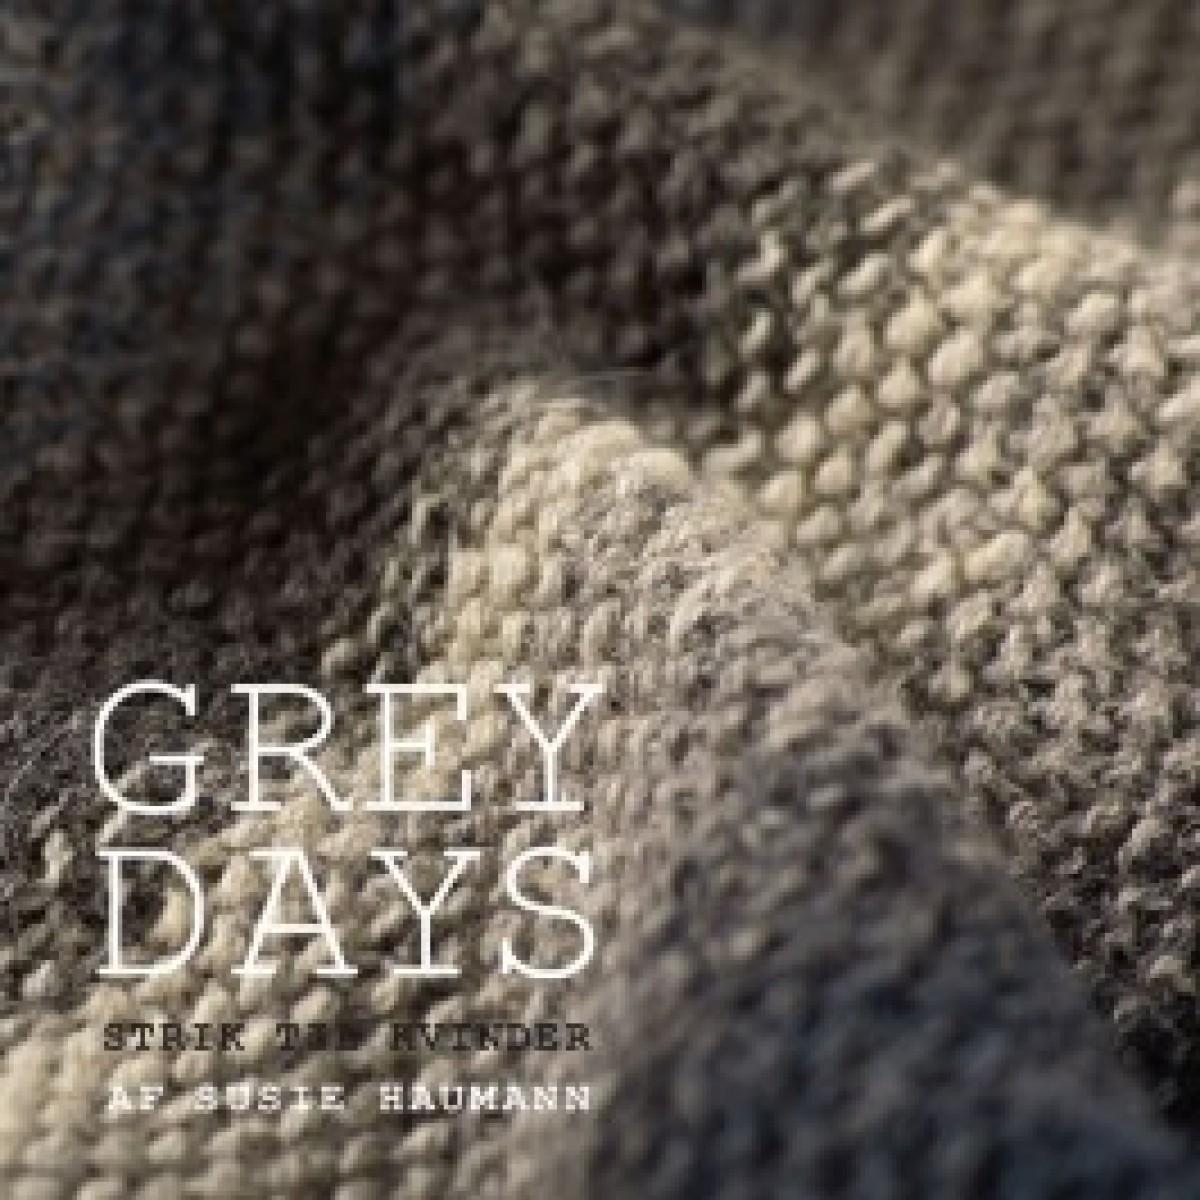 GreyDays-31